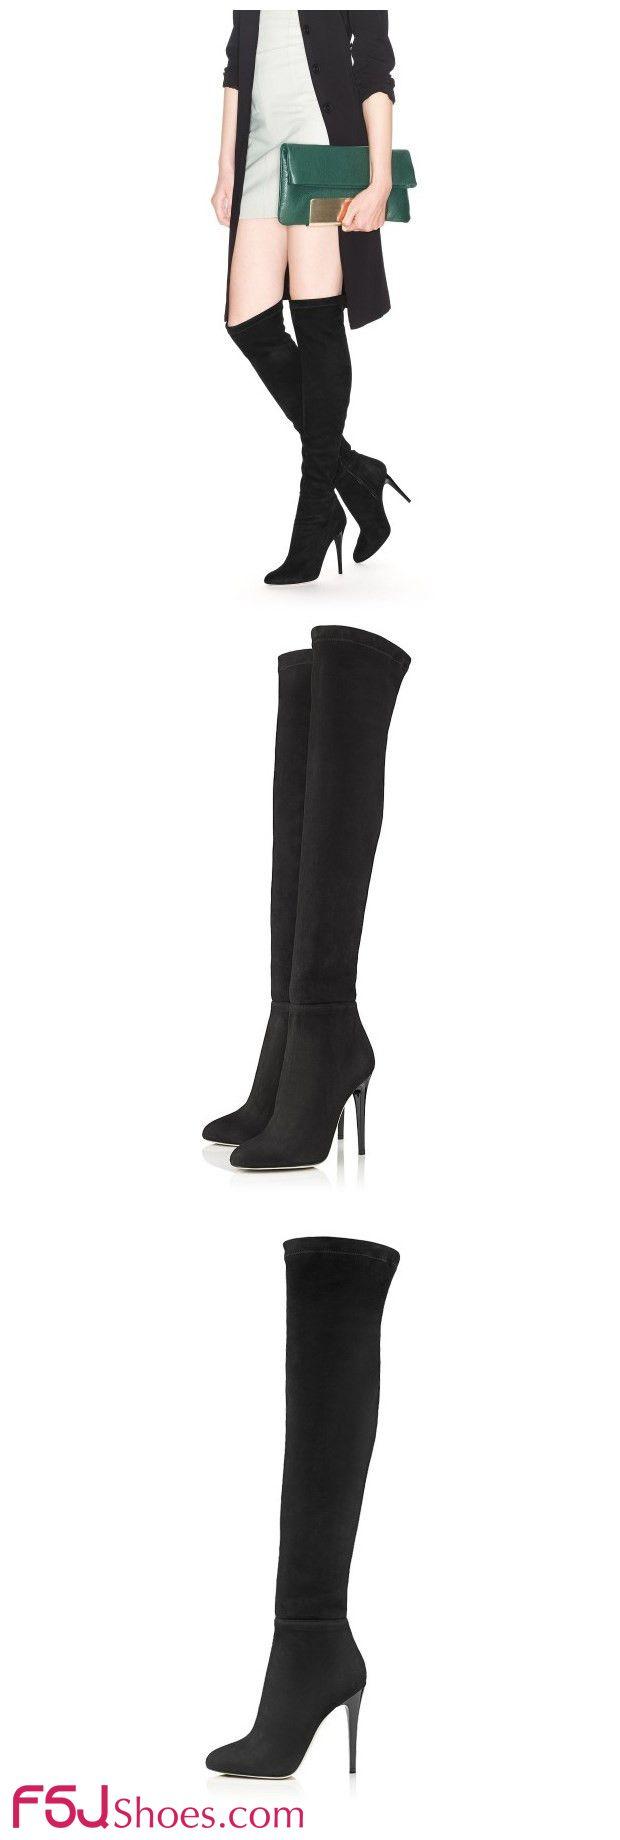 #FSJShoes #FSJ ファンション スティレットヒール 尖ったつま先 セクシーなサイハイブーツ 美脚 美しい長いブーツ 黒靴